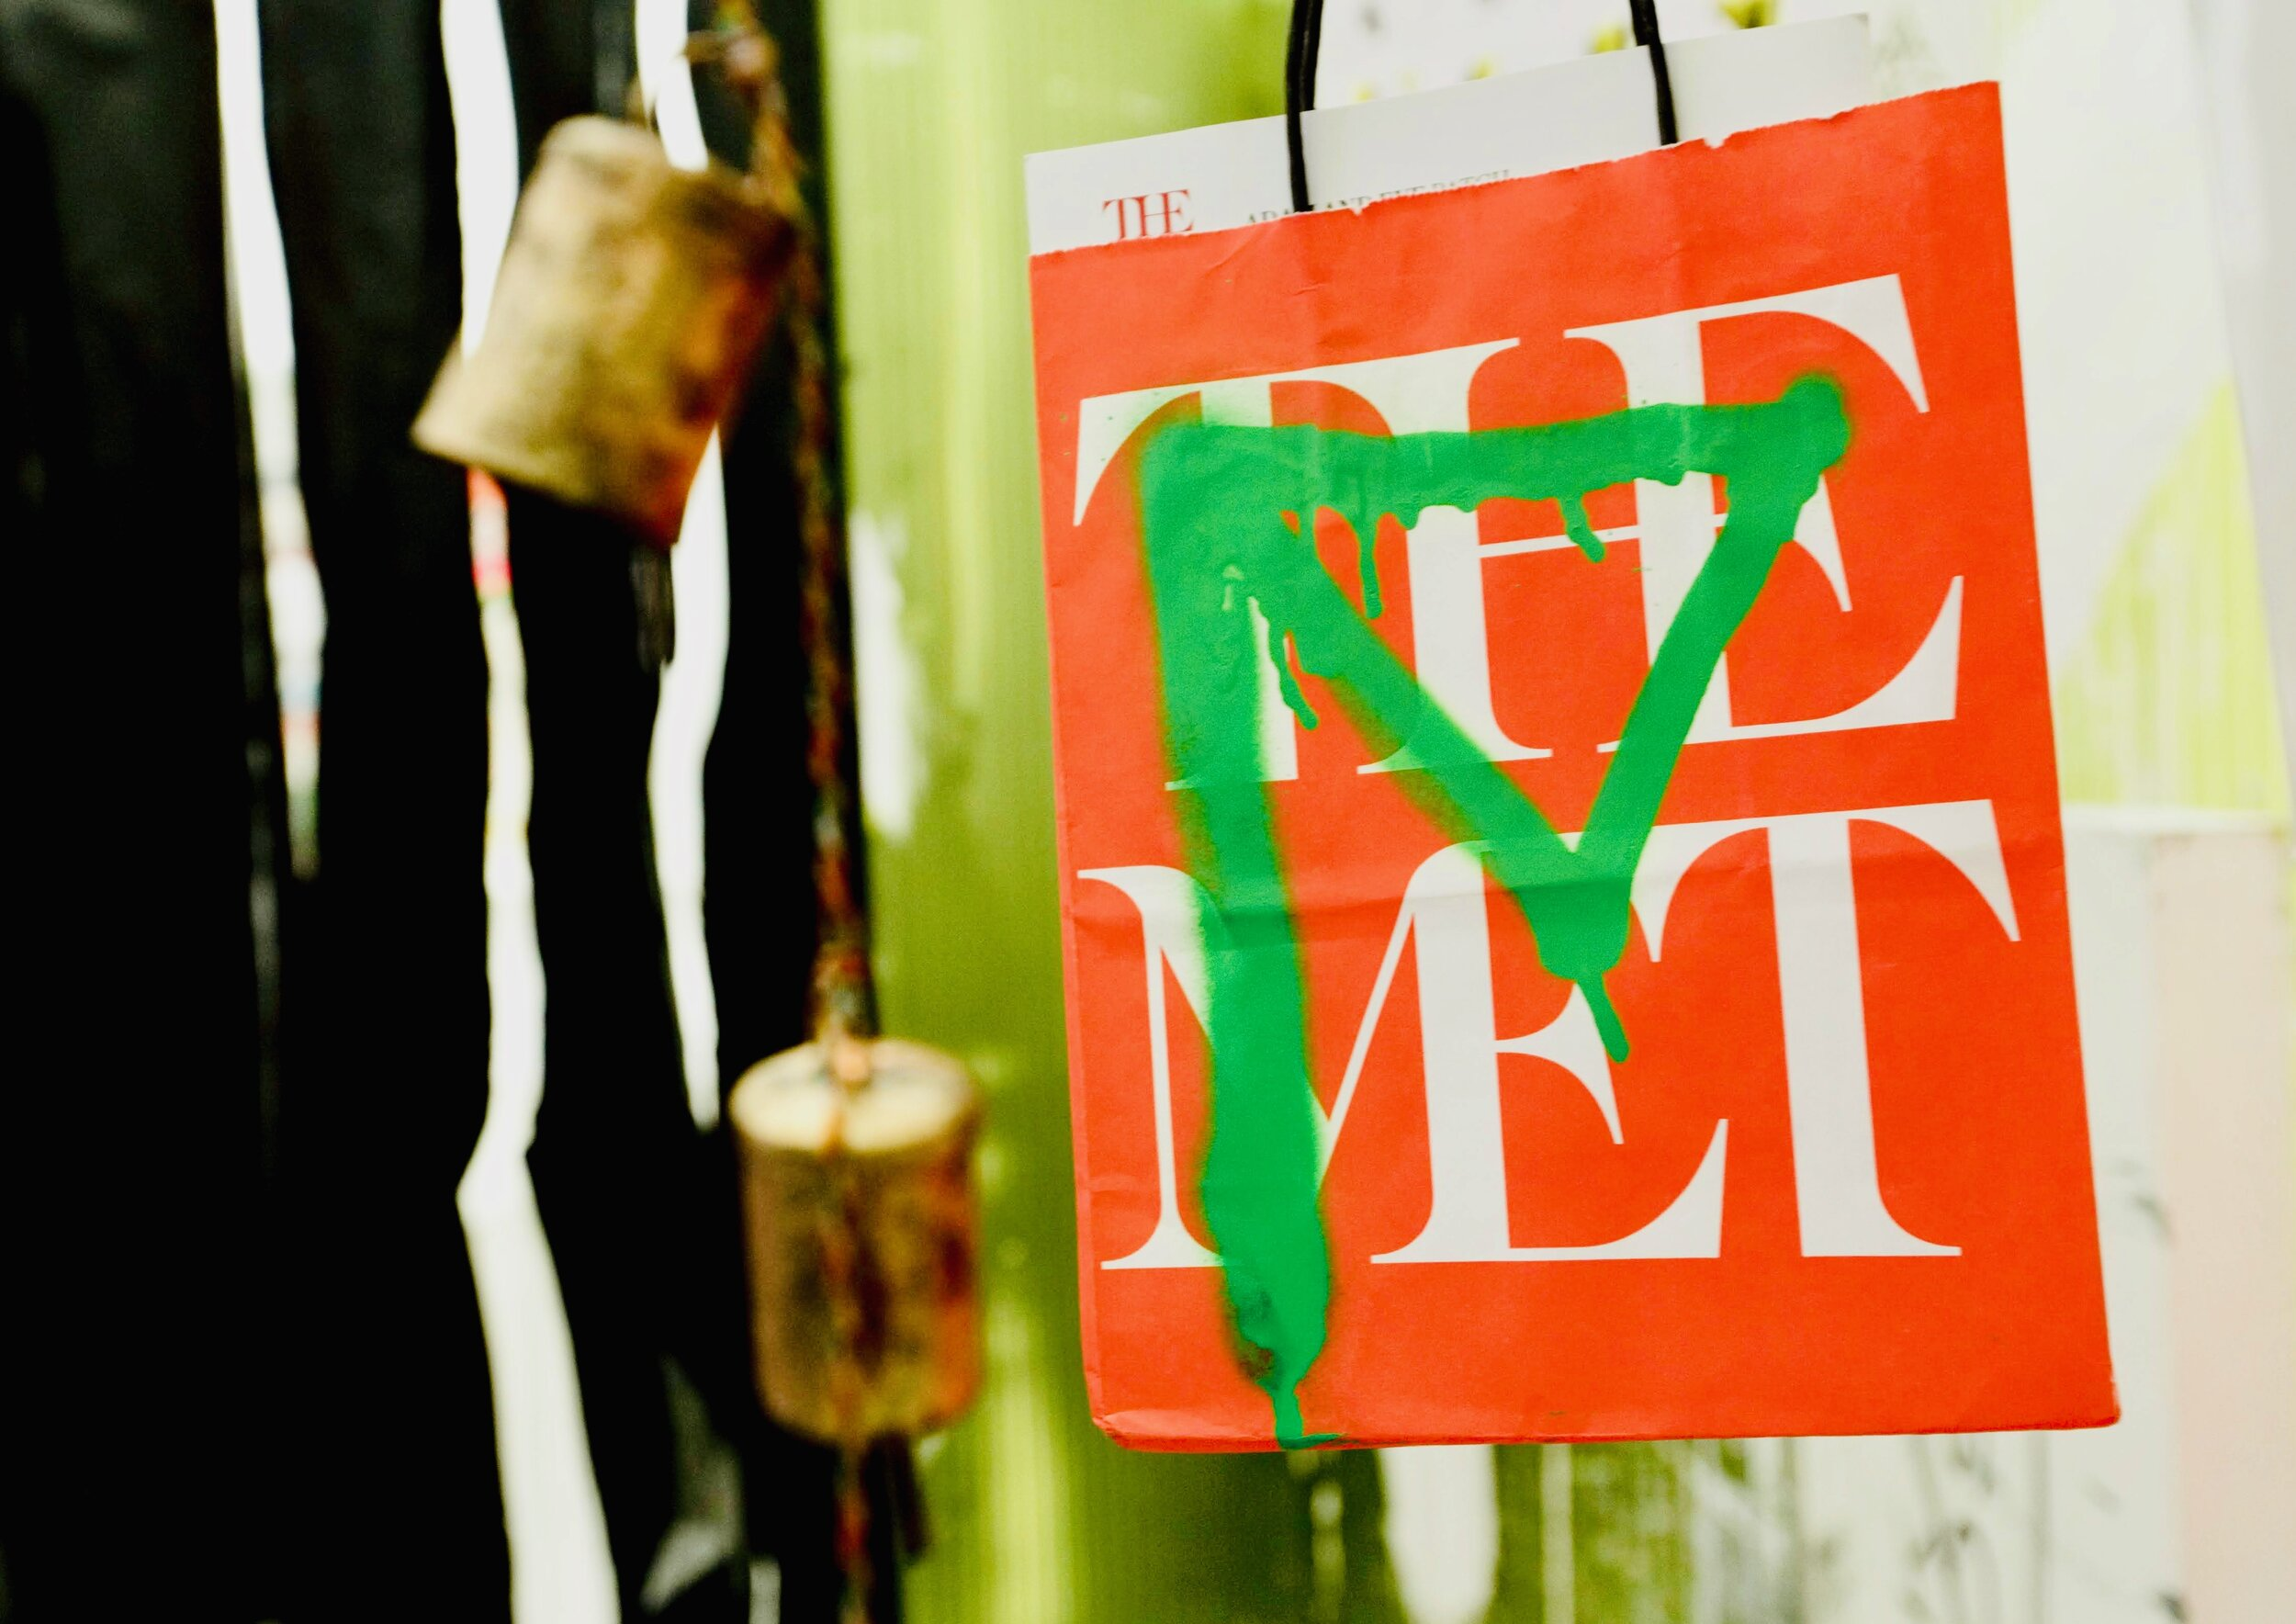 (above) Guzman's signature phantom figure in green adorning a shopping bag from the Metropolitan Museum of Art